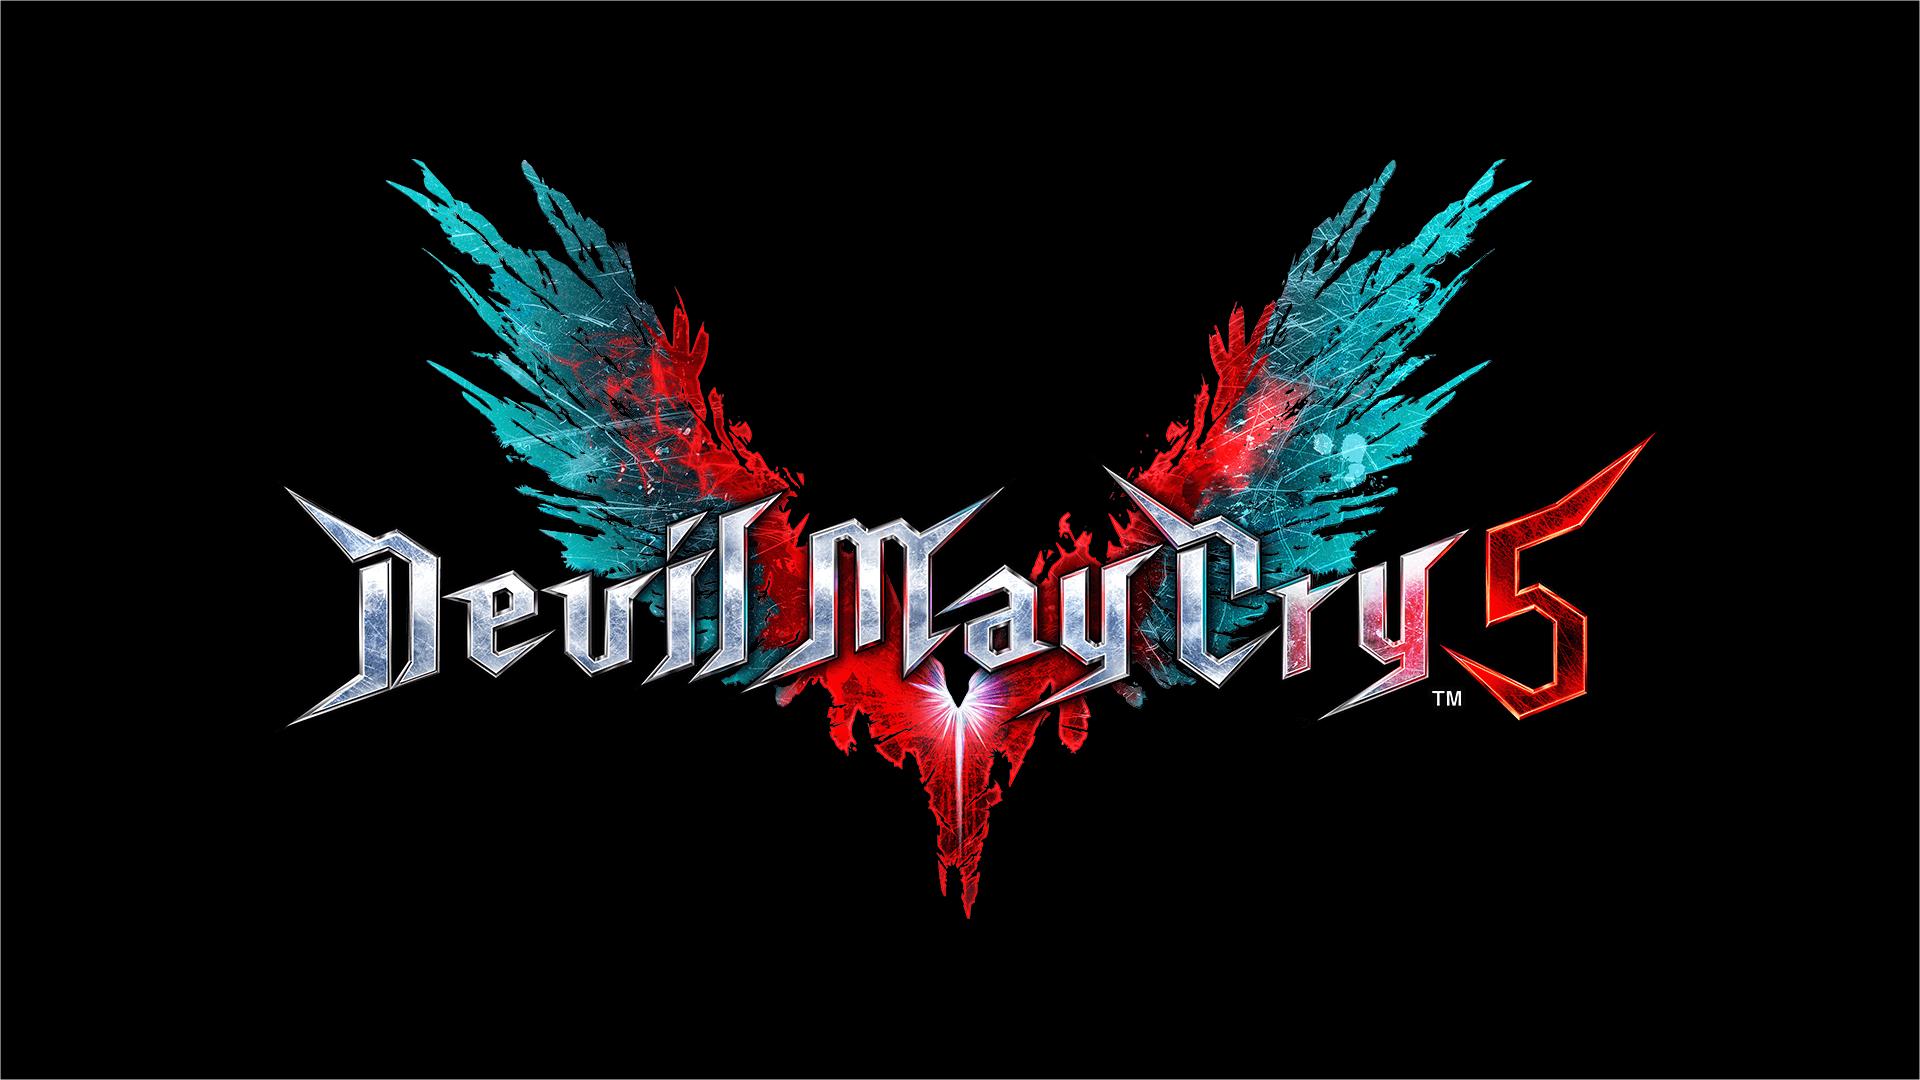 logo is property of Capcom